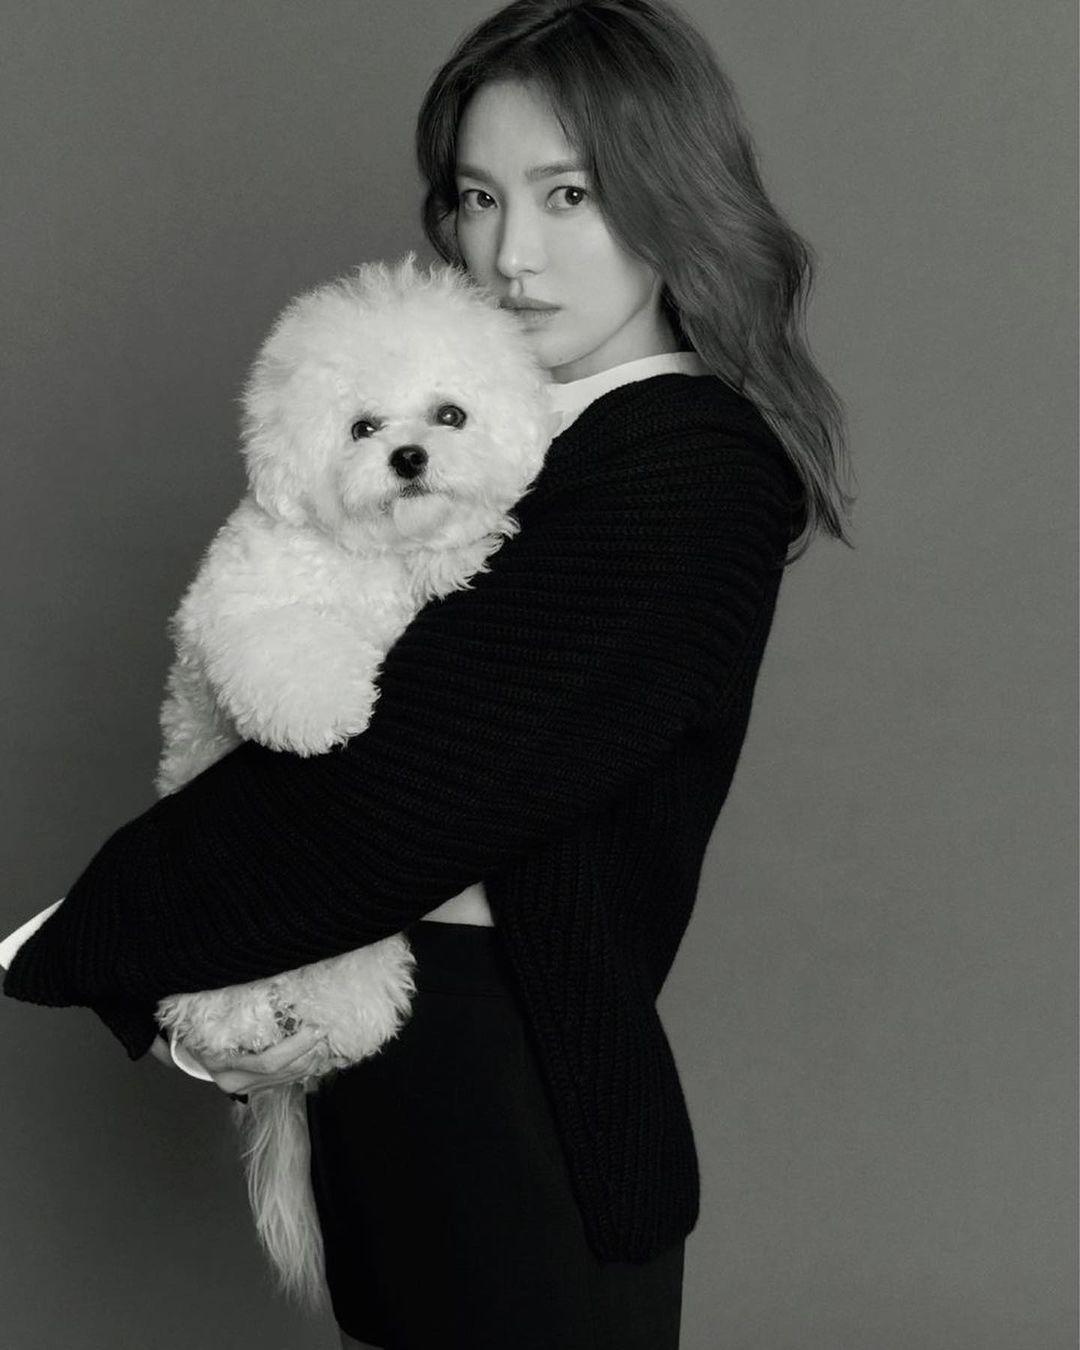 Song Hye Kyo's Ruby